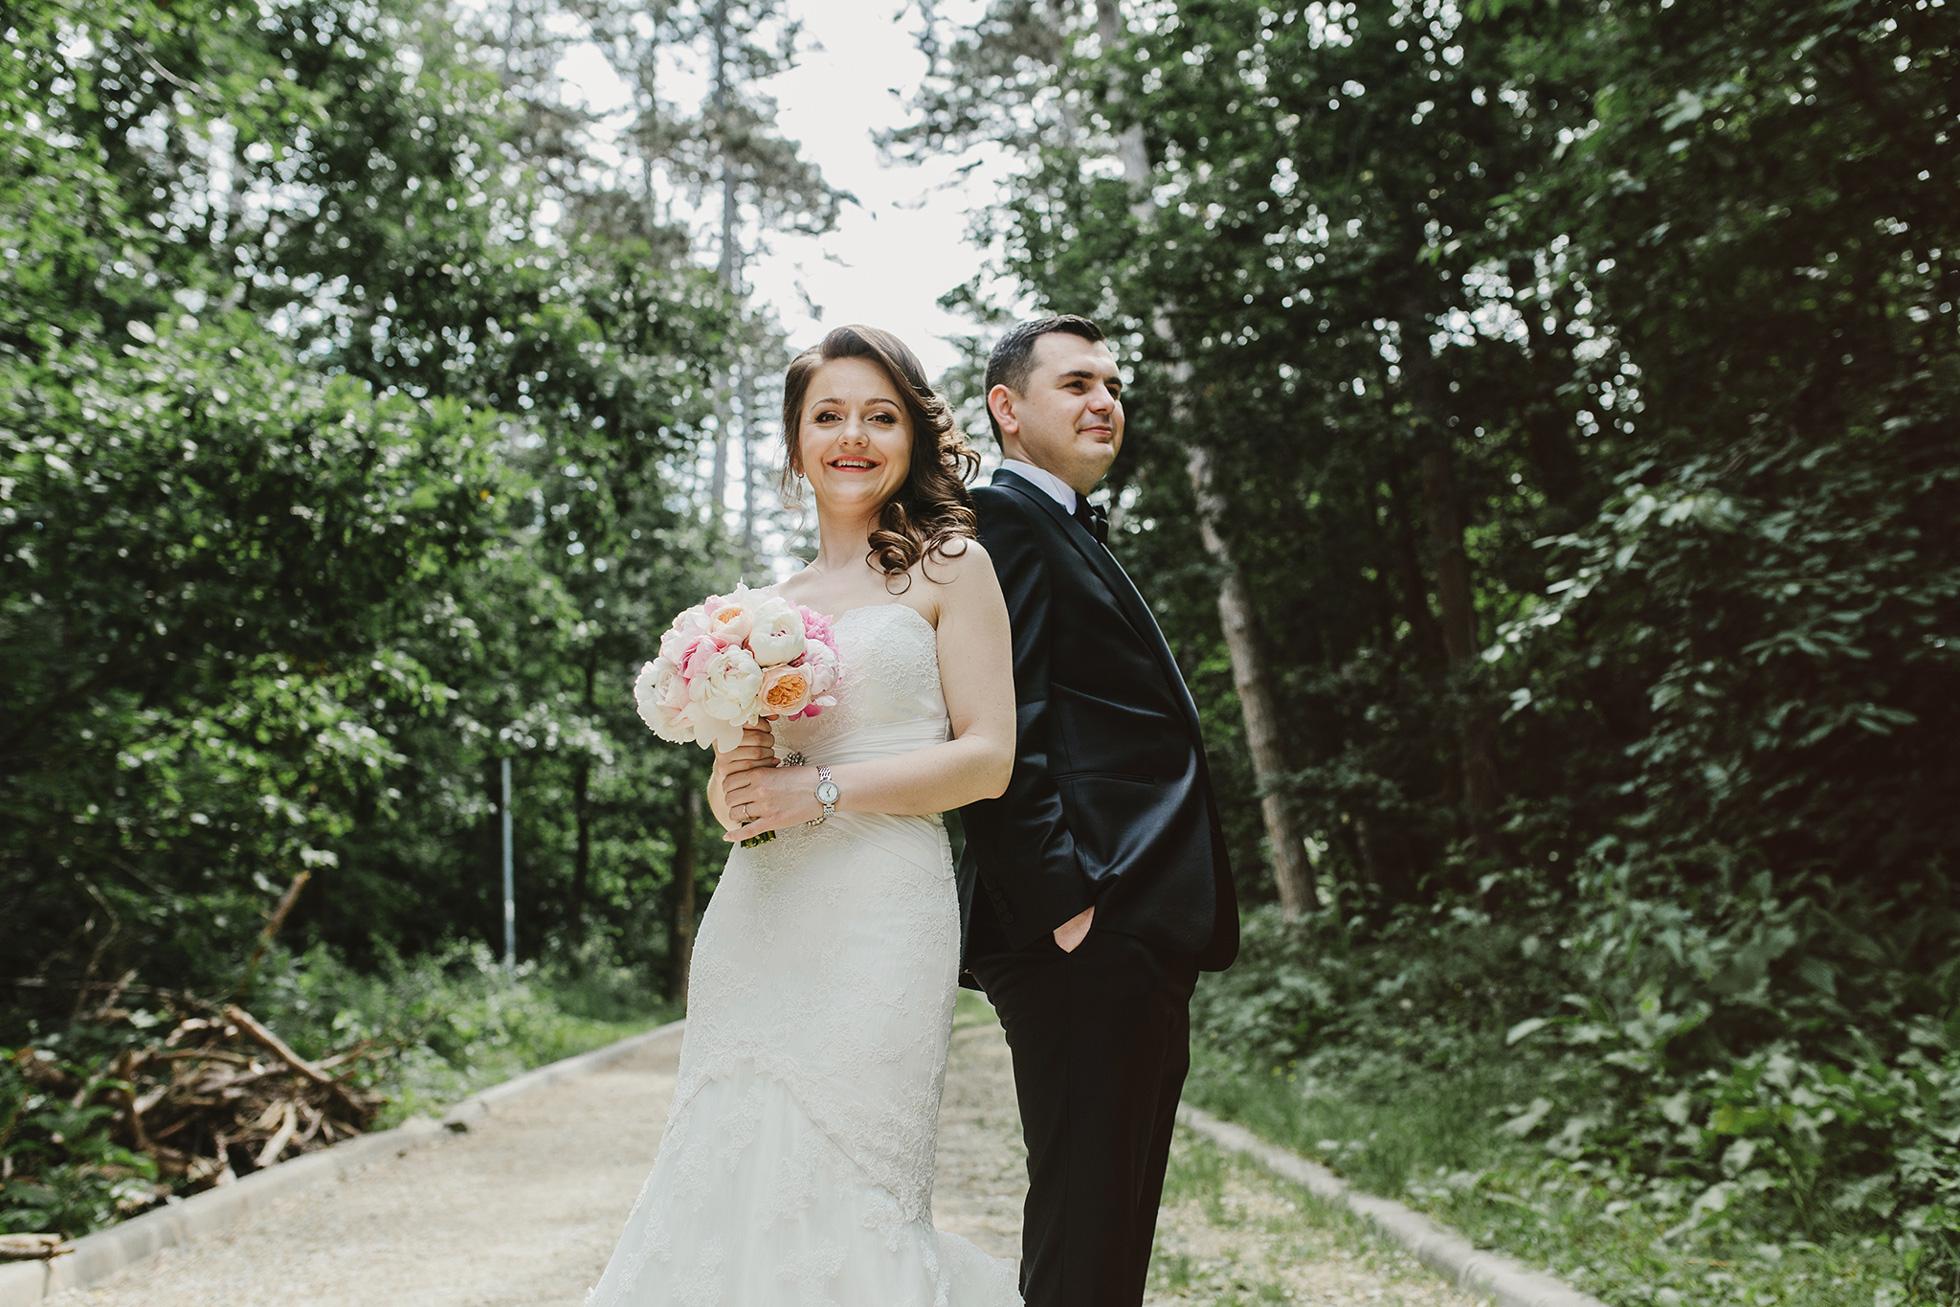 Liana-+-Florin-{wedding}-067